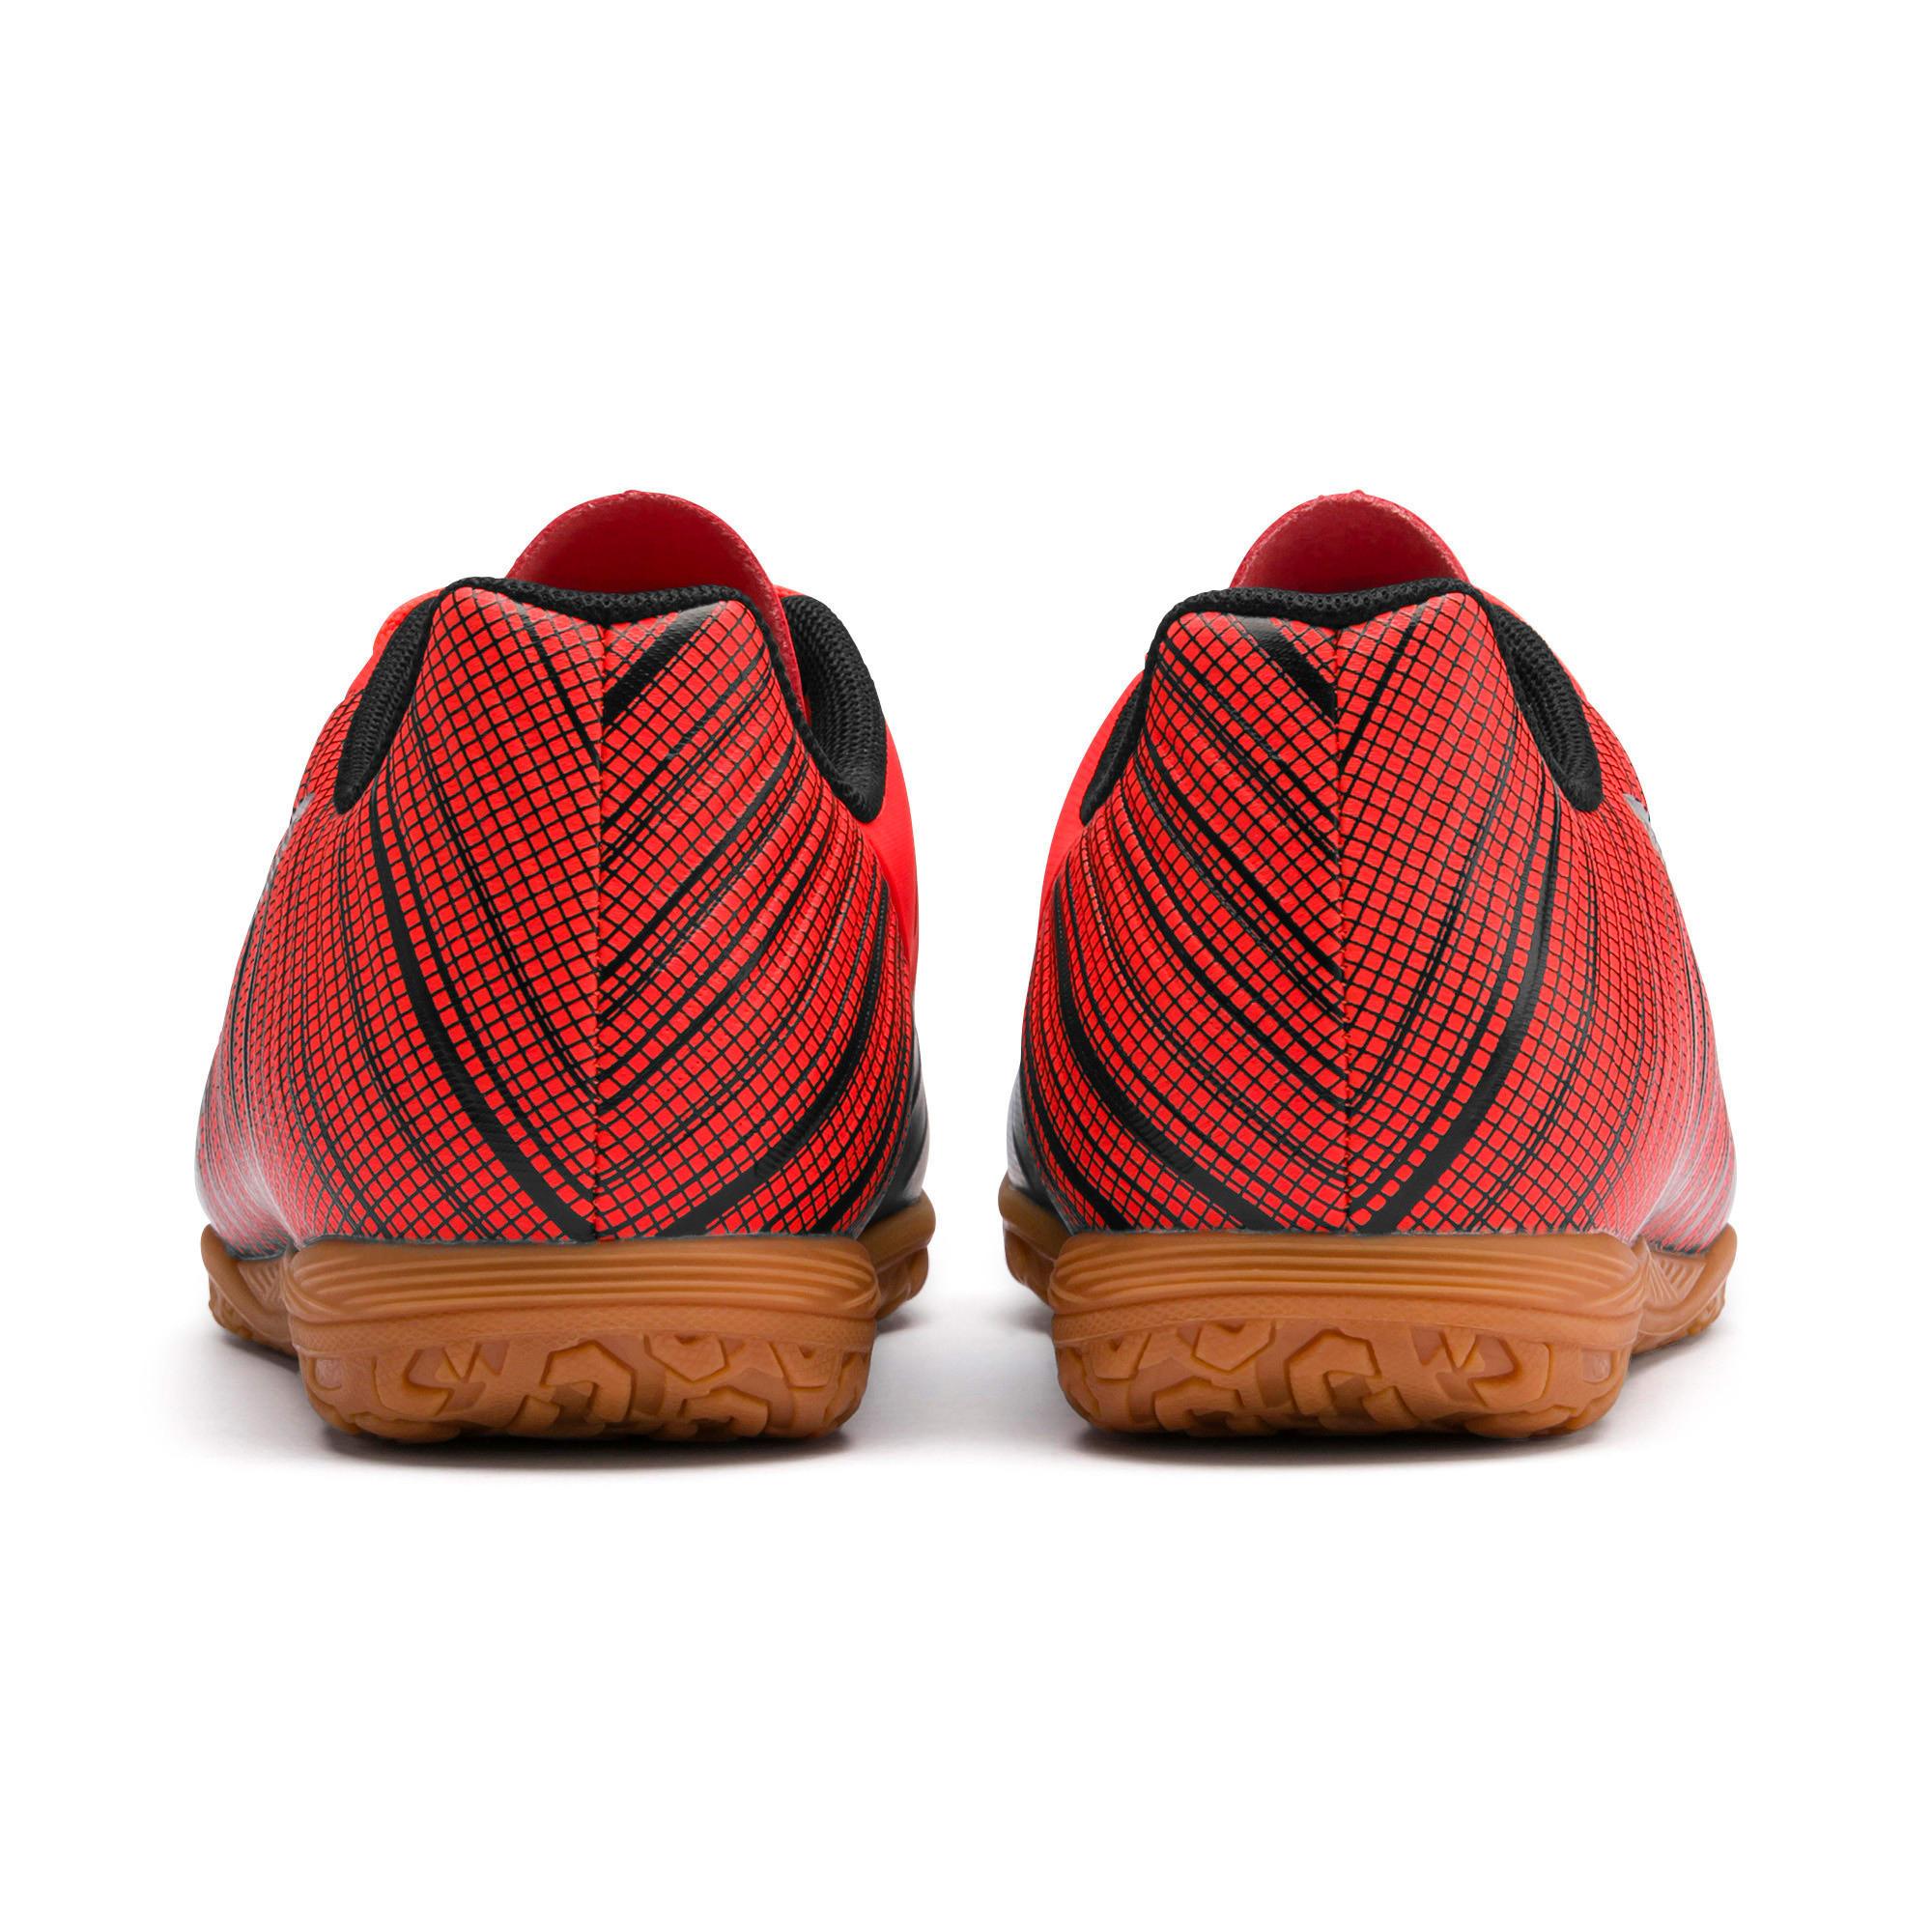 Miniatura 3 de Zapatos de fútbol PUMA ONE 5.4 IT JR, Black-Red-Aged Silver-Gum, mediano